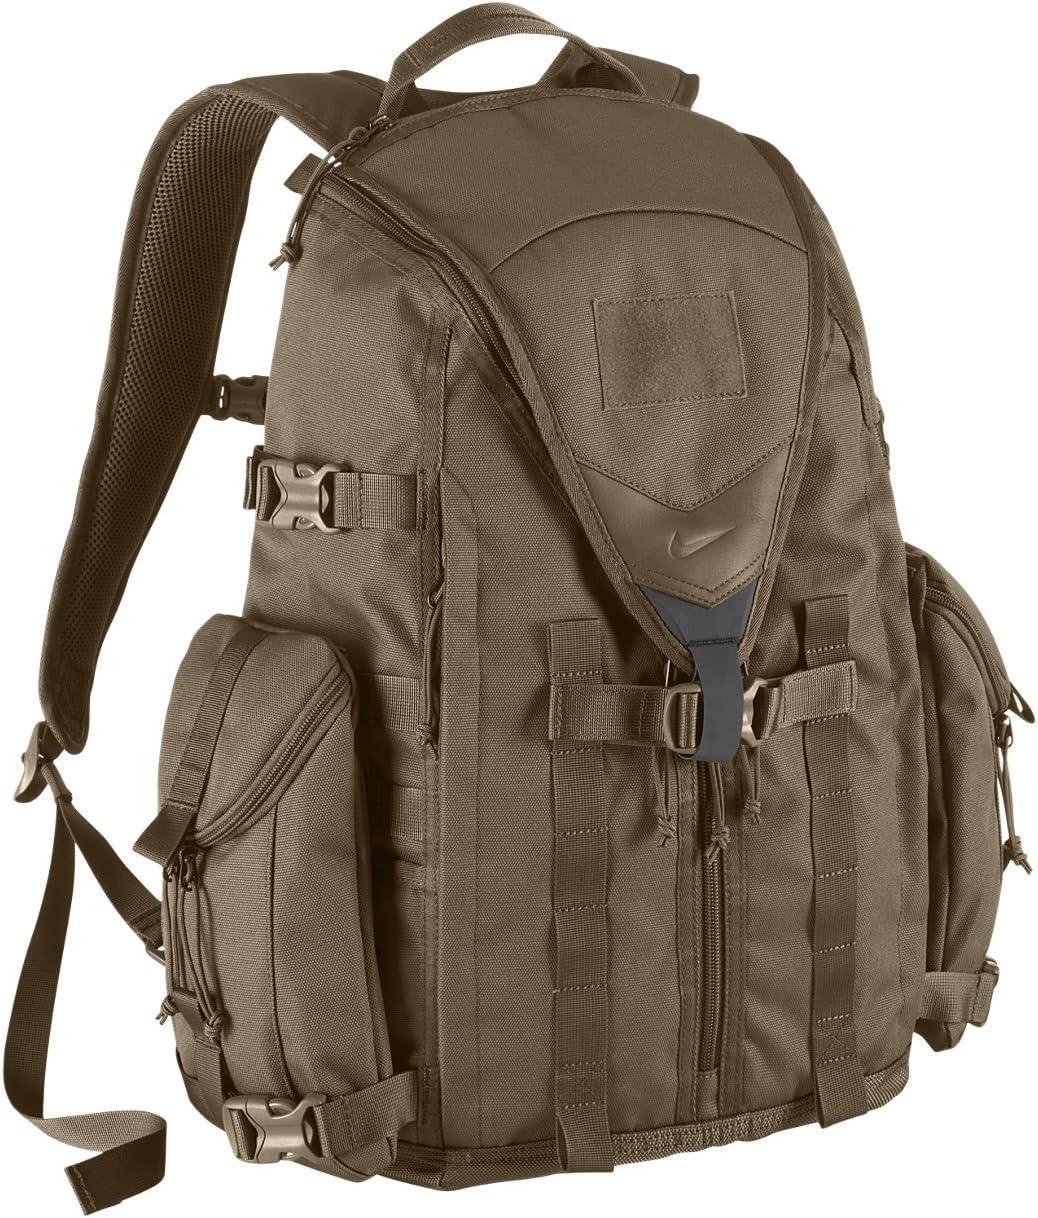 Nike SFS Responder Backpack Military BrownMilitary BrownMilitary Brown Backpack Bags